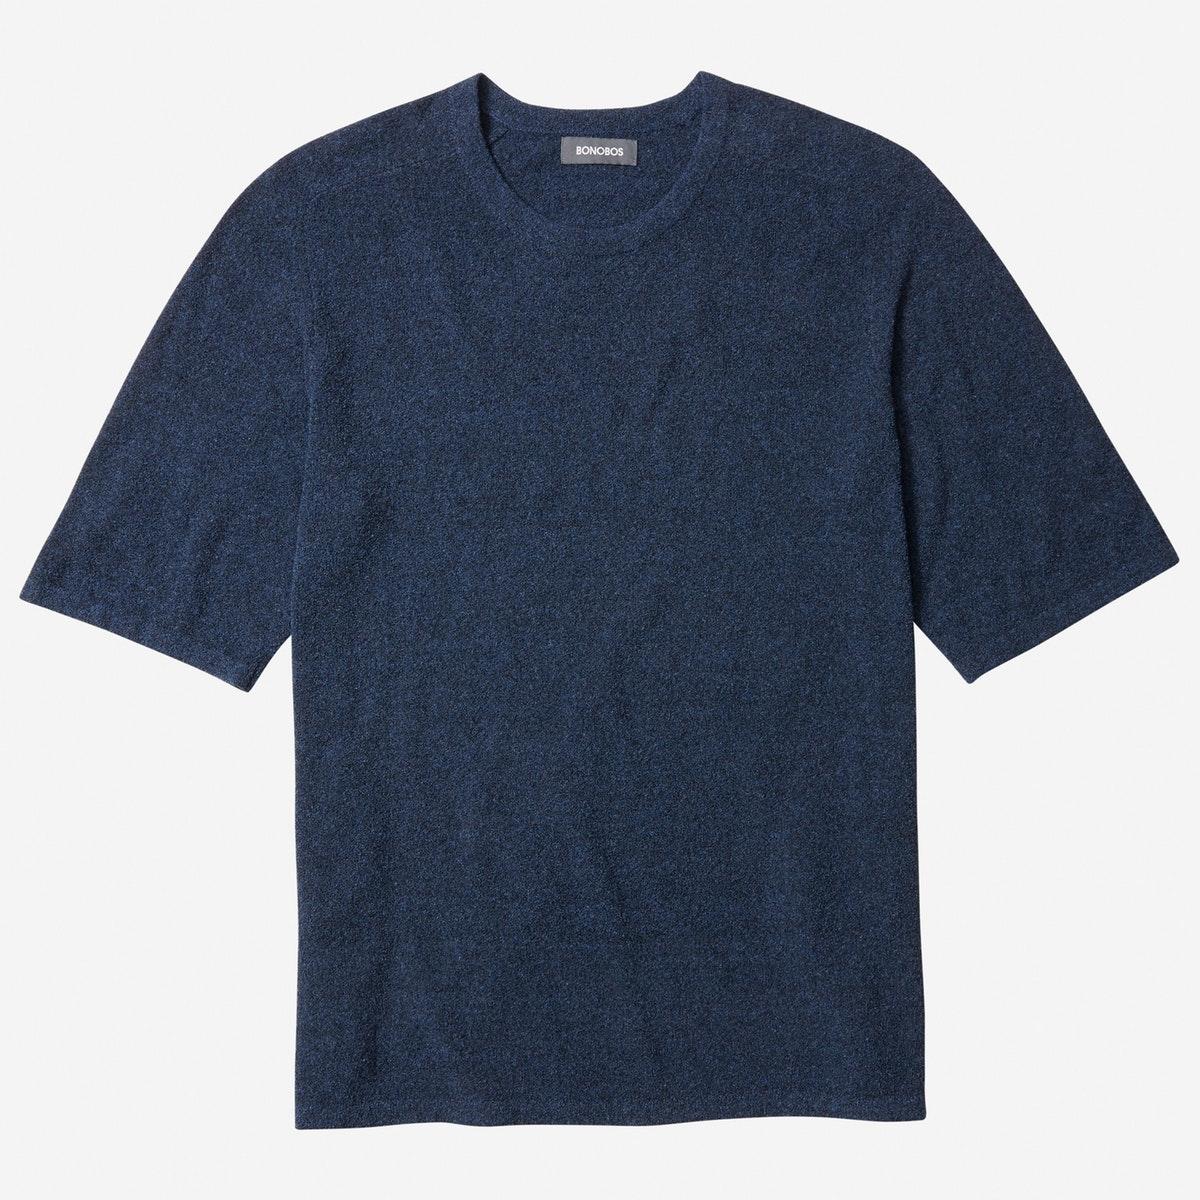 Cotton Boucle Short Sleeve Sweater